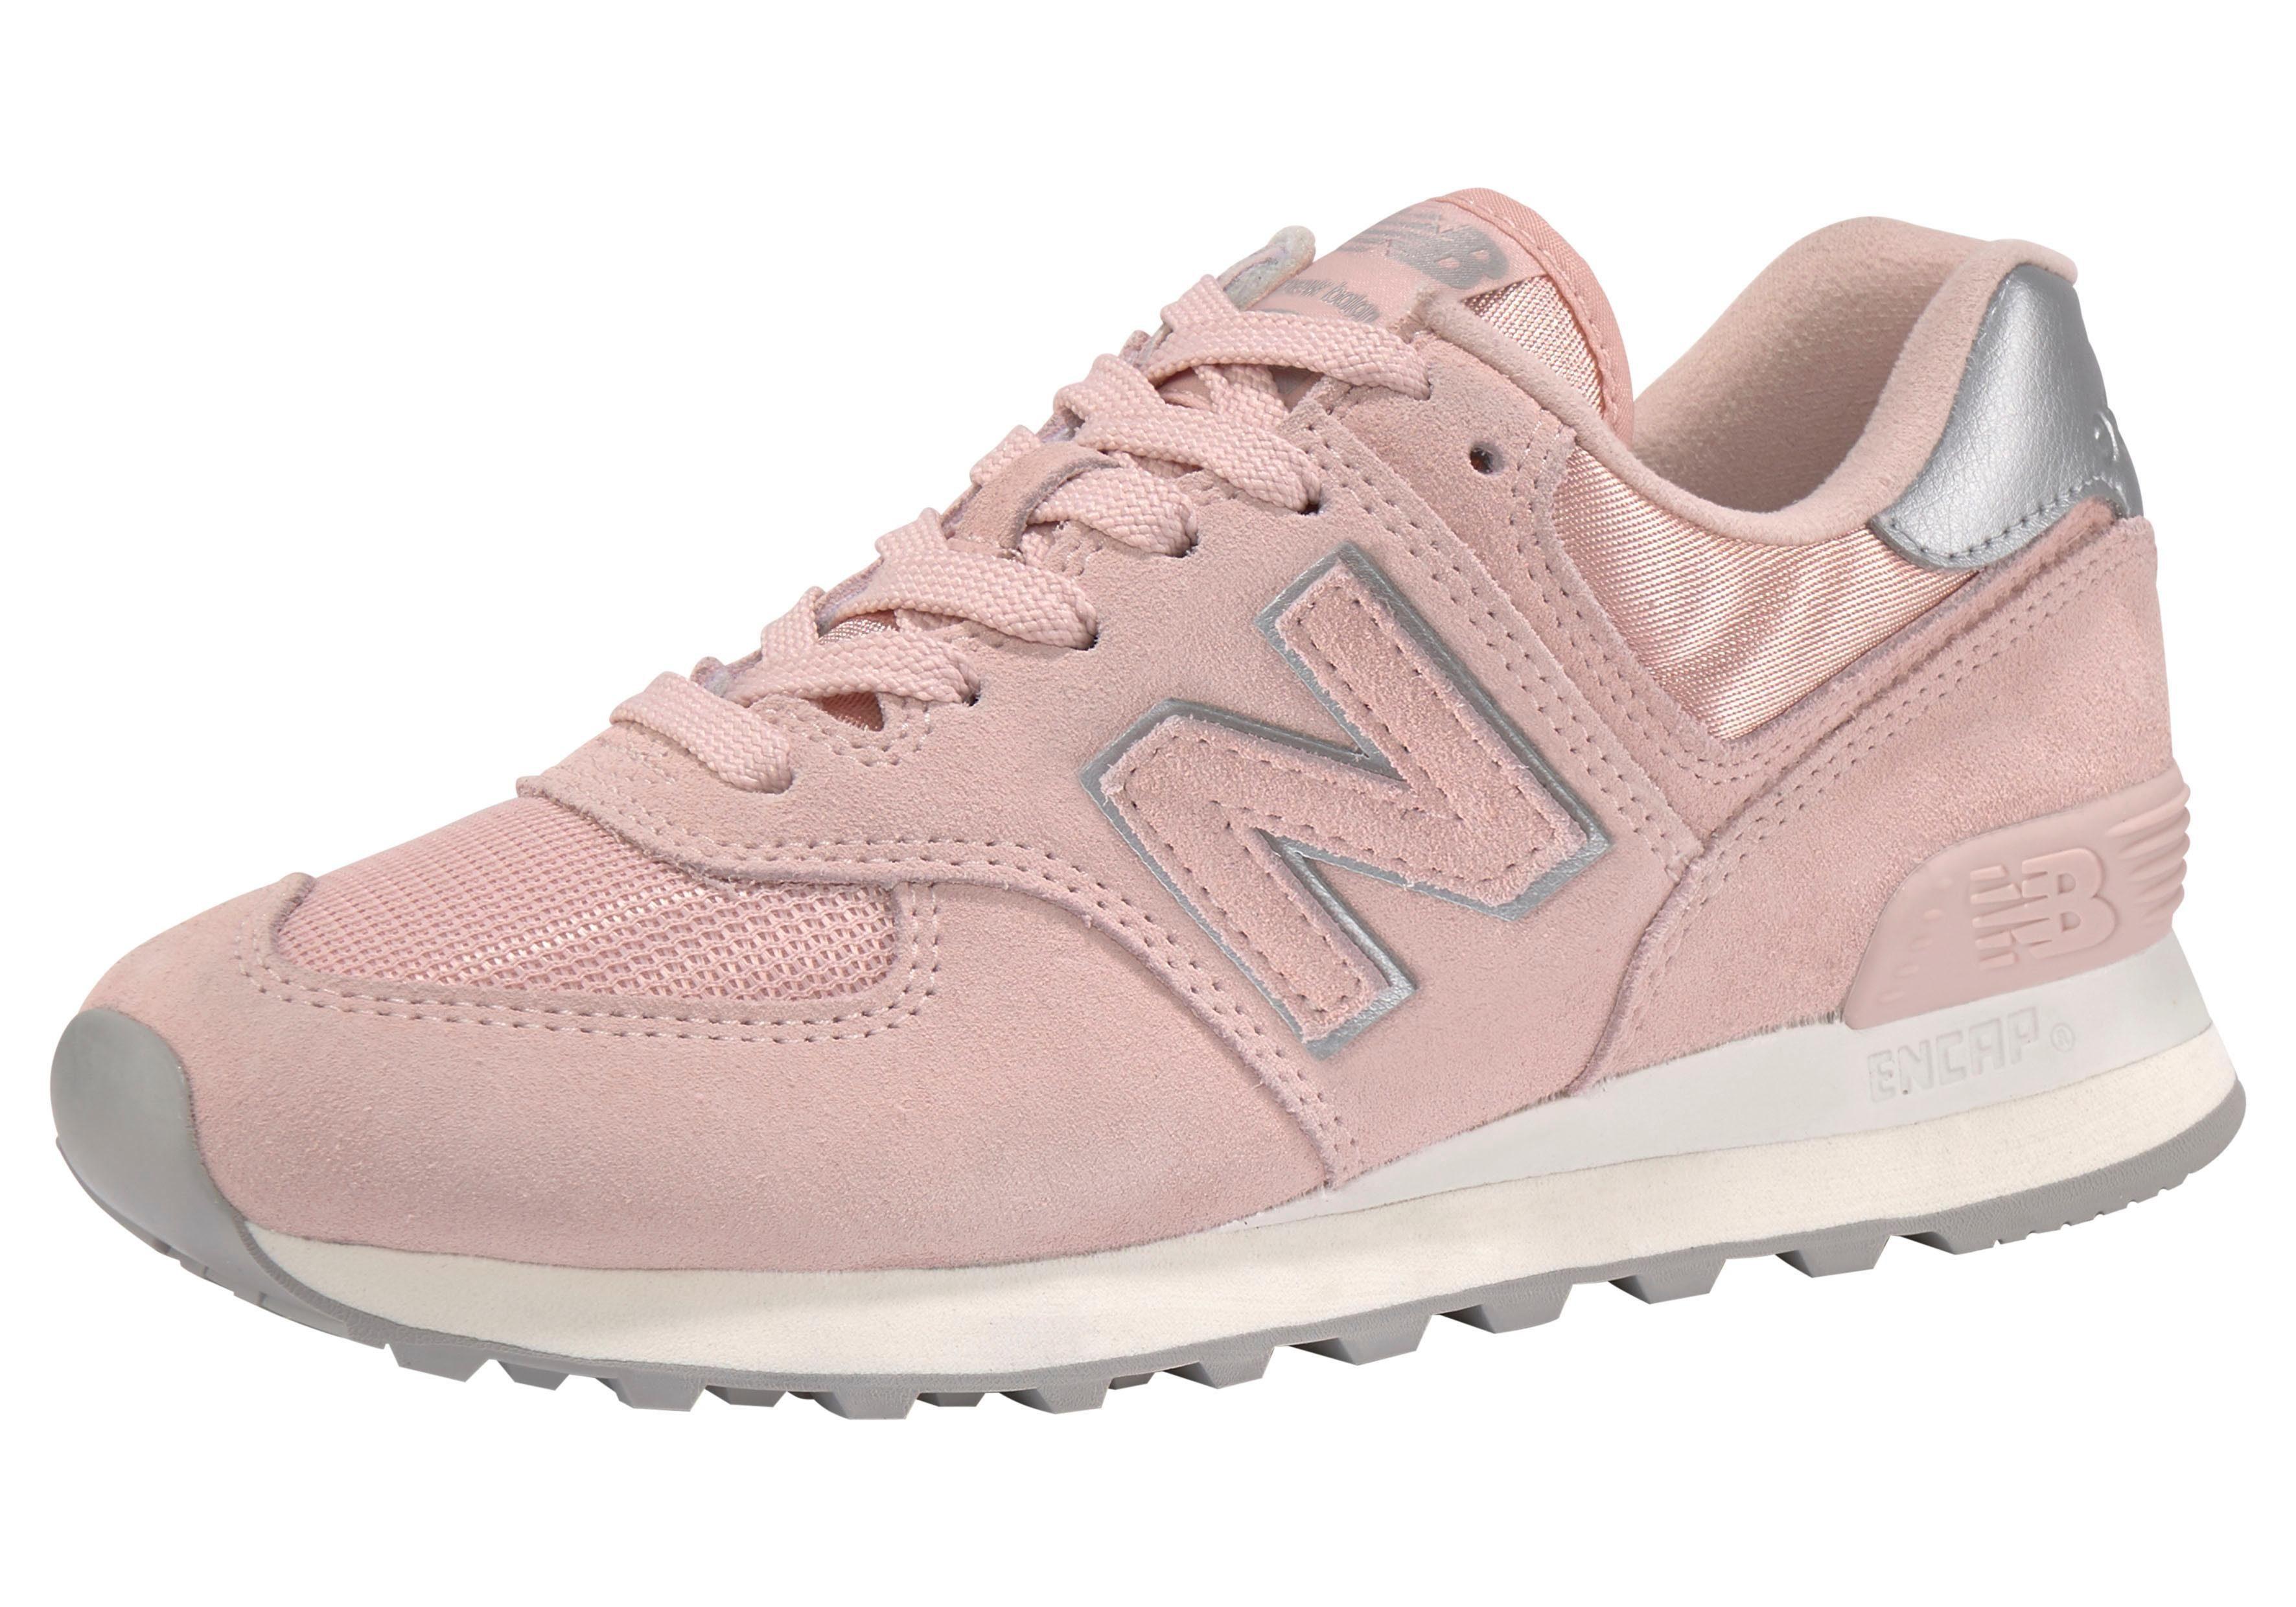 New Balance Wl220 Sneaker Low Damen Beige Schuhe Liebe